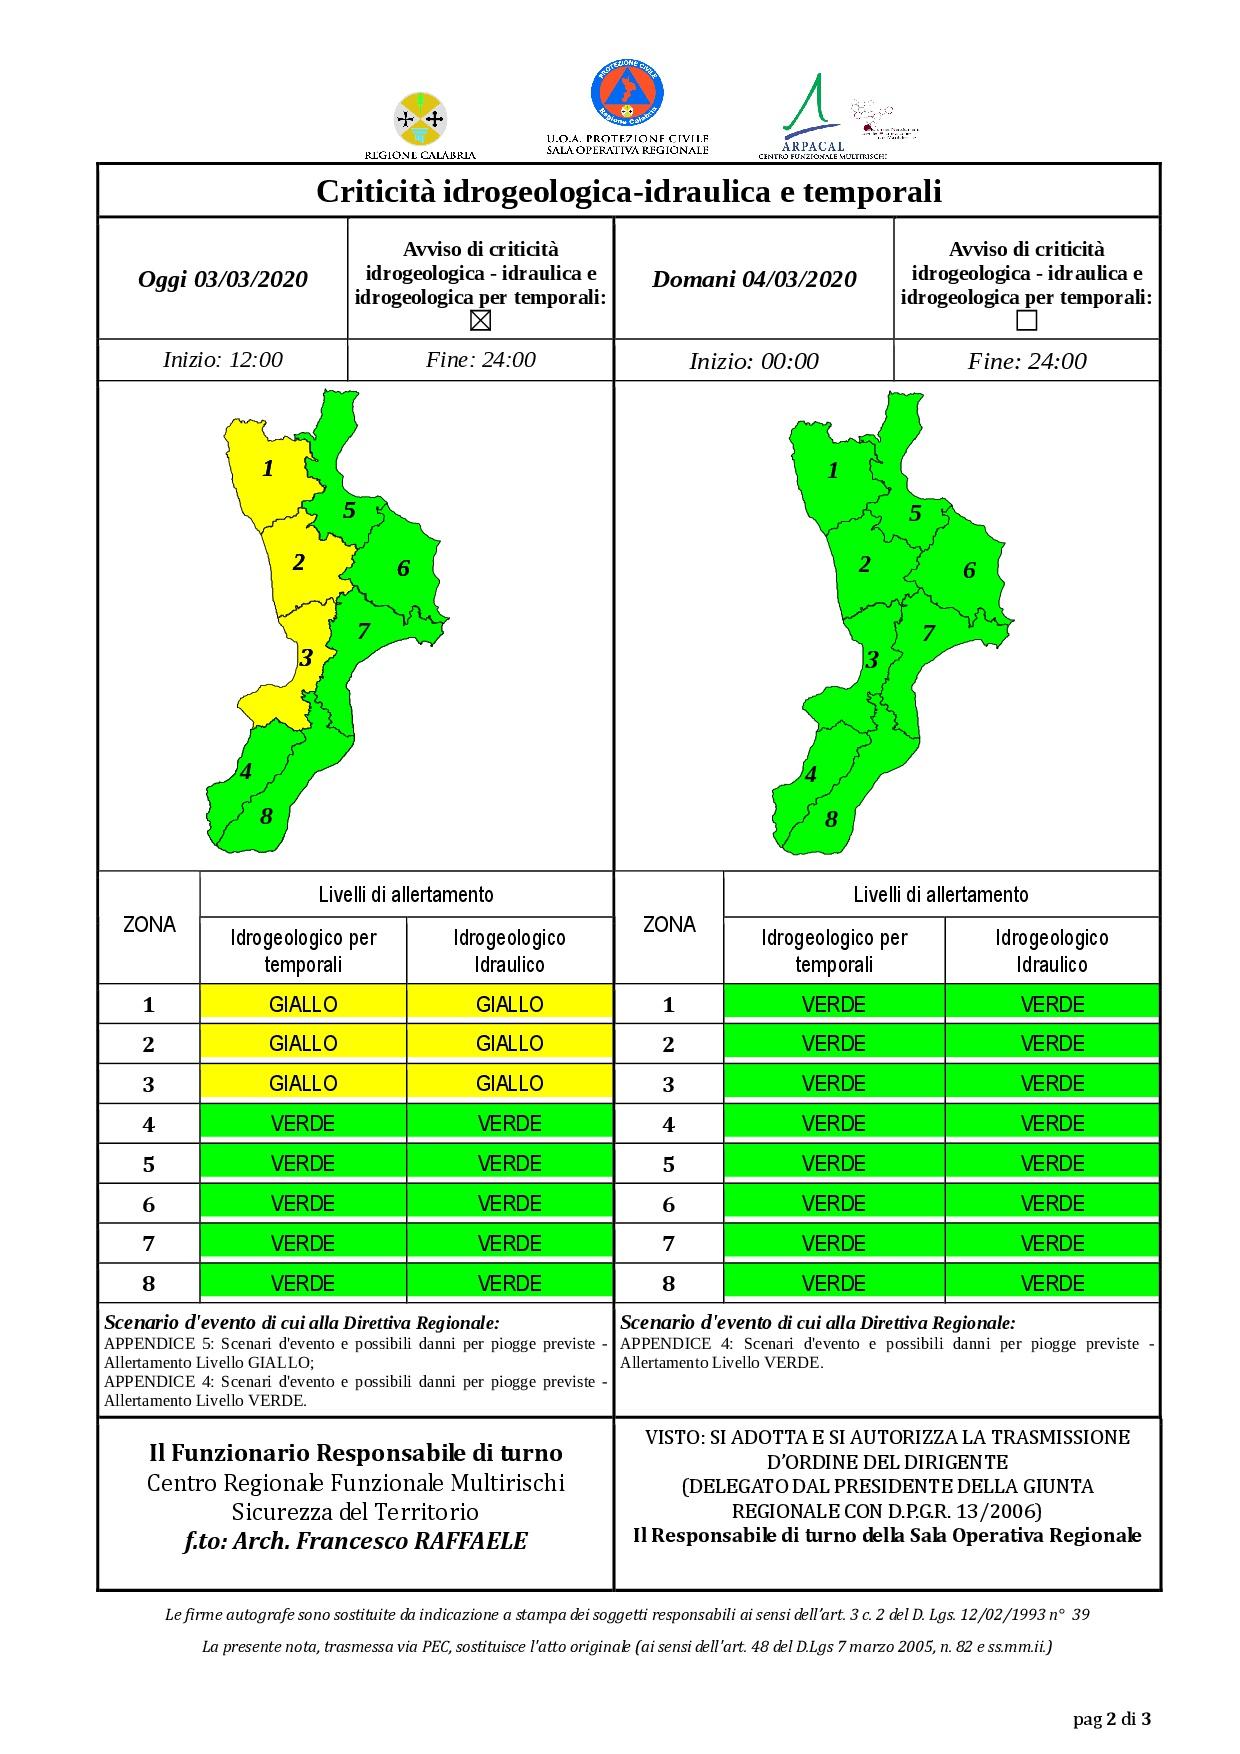 Criticità idrogeologica-idraulica e temporali in Calabria 03-03-2020